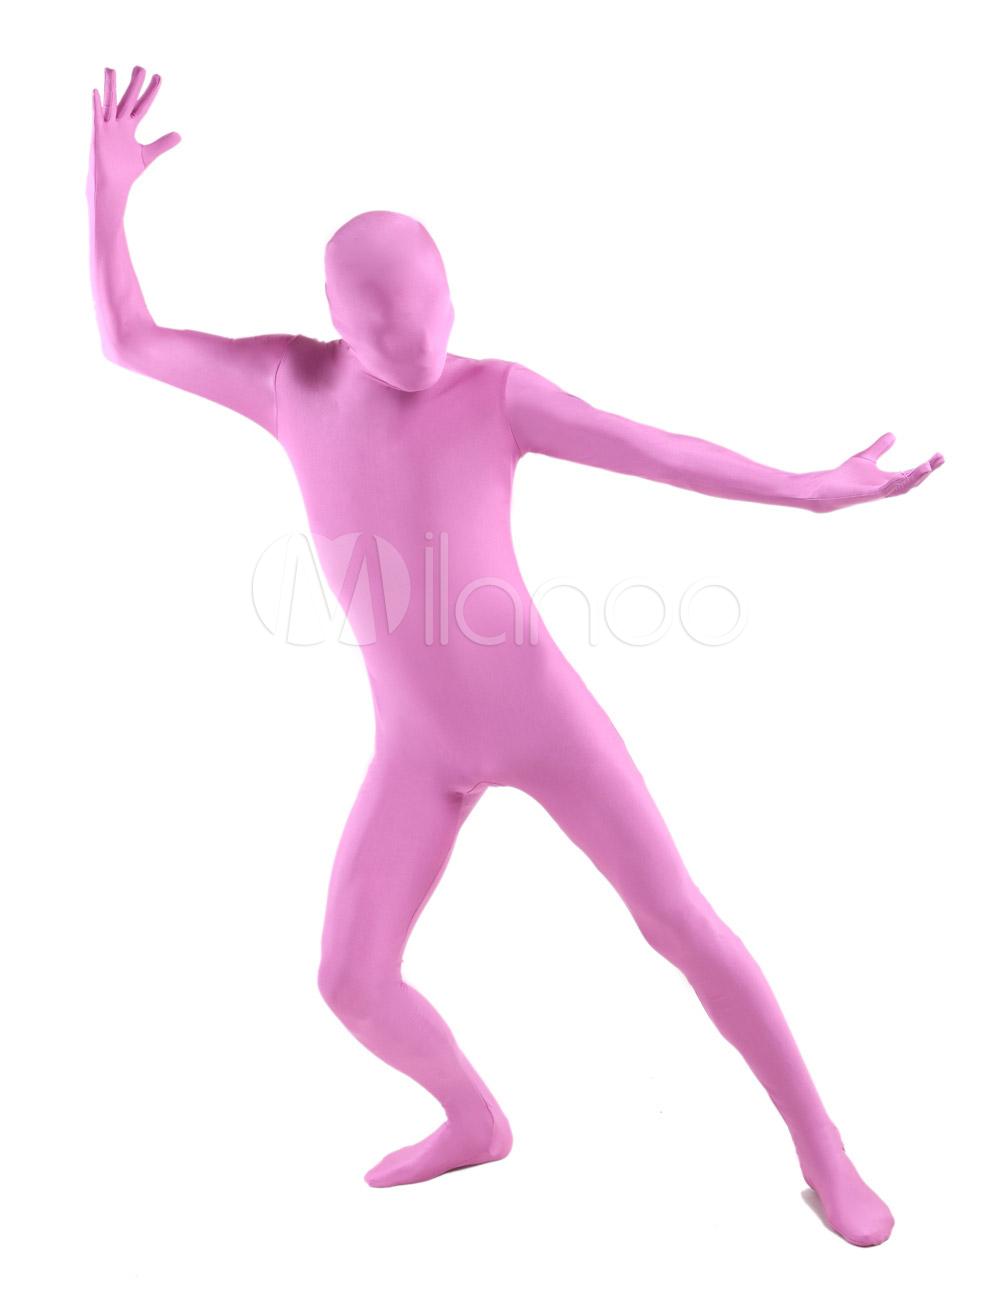 Costume de zentai populaire combinaison enveloppé unisexe en lycra spandex rose - Milanoo.com